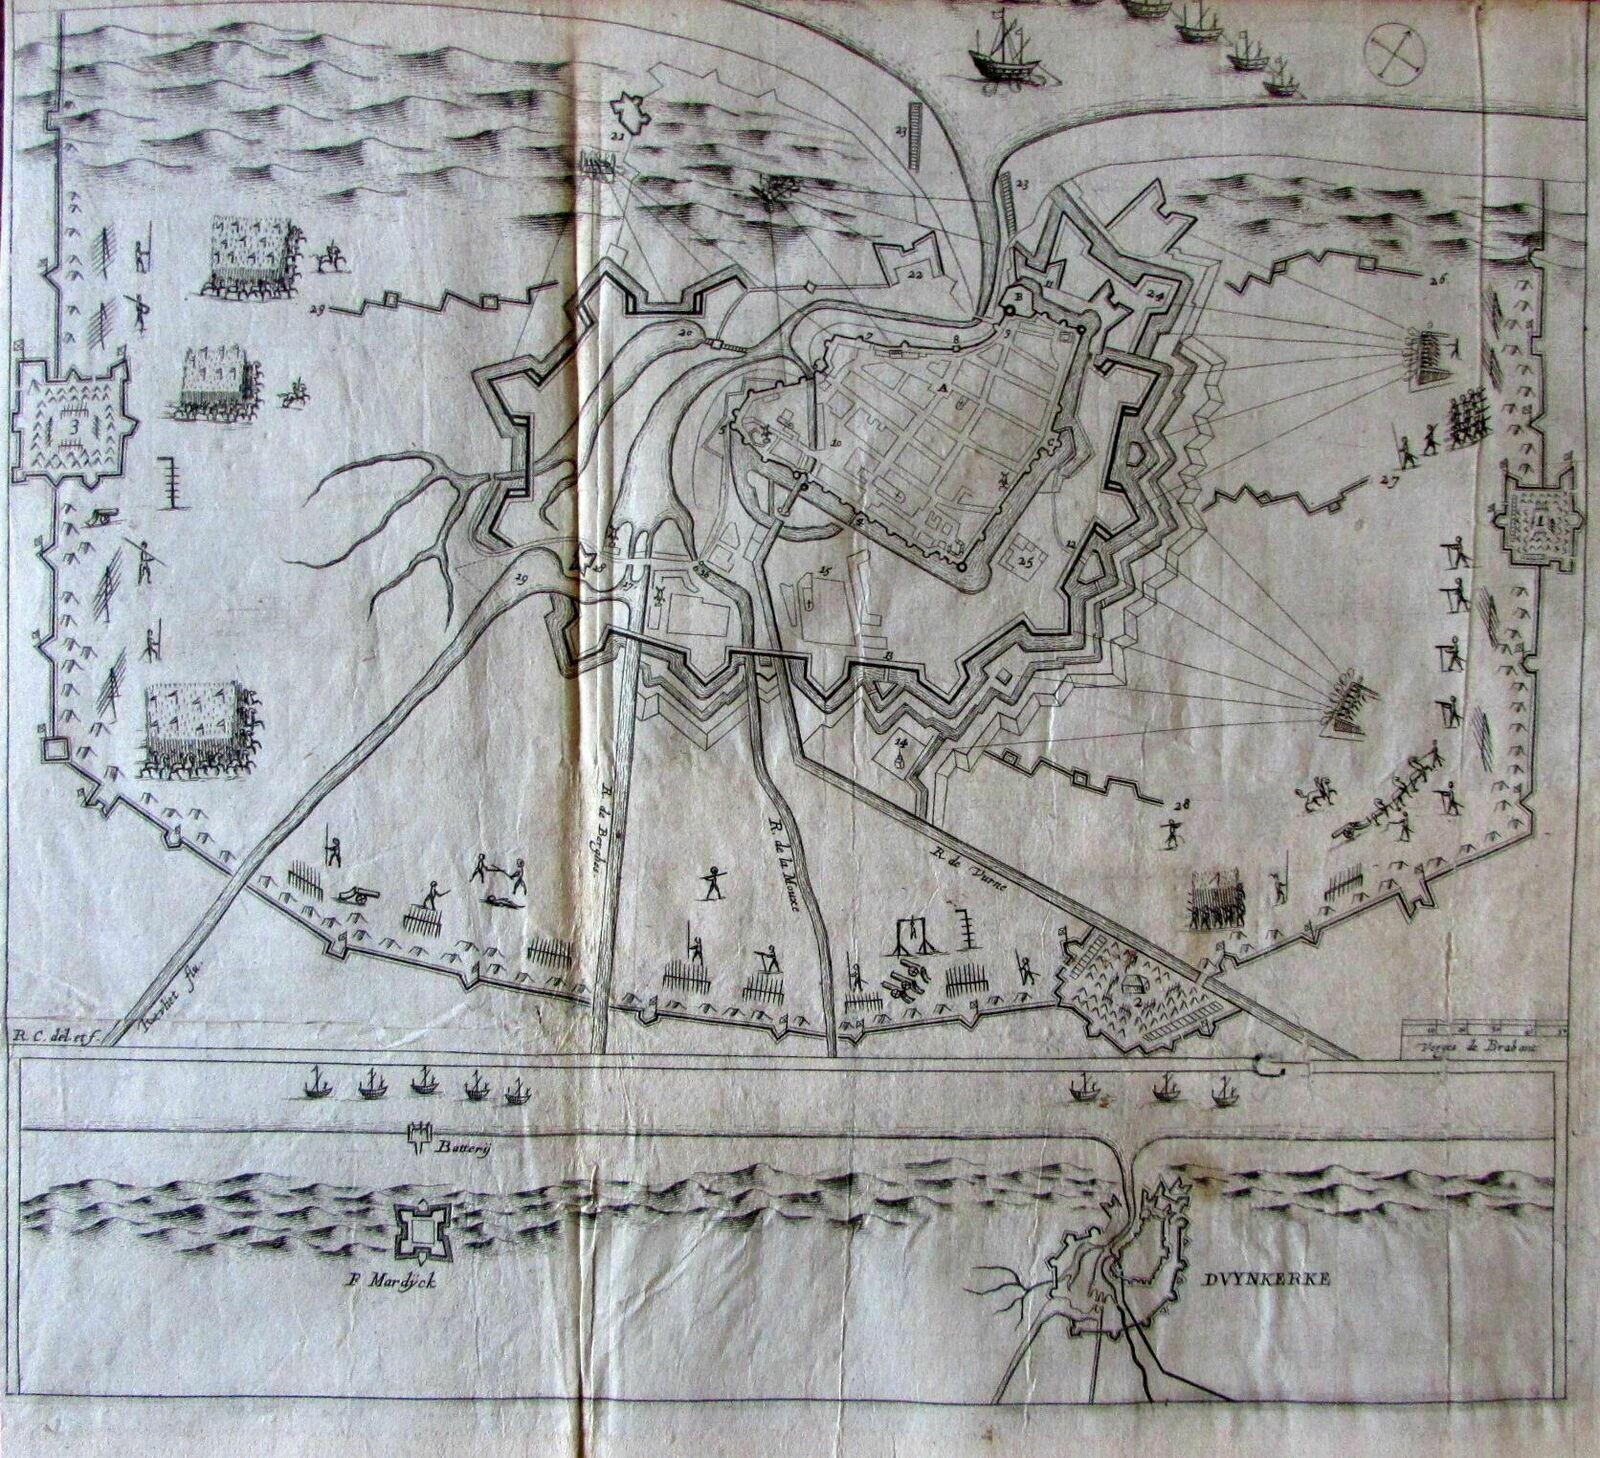 Map Of Northern France Coastline.Dunkirk Northern France Coast Battle Map C